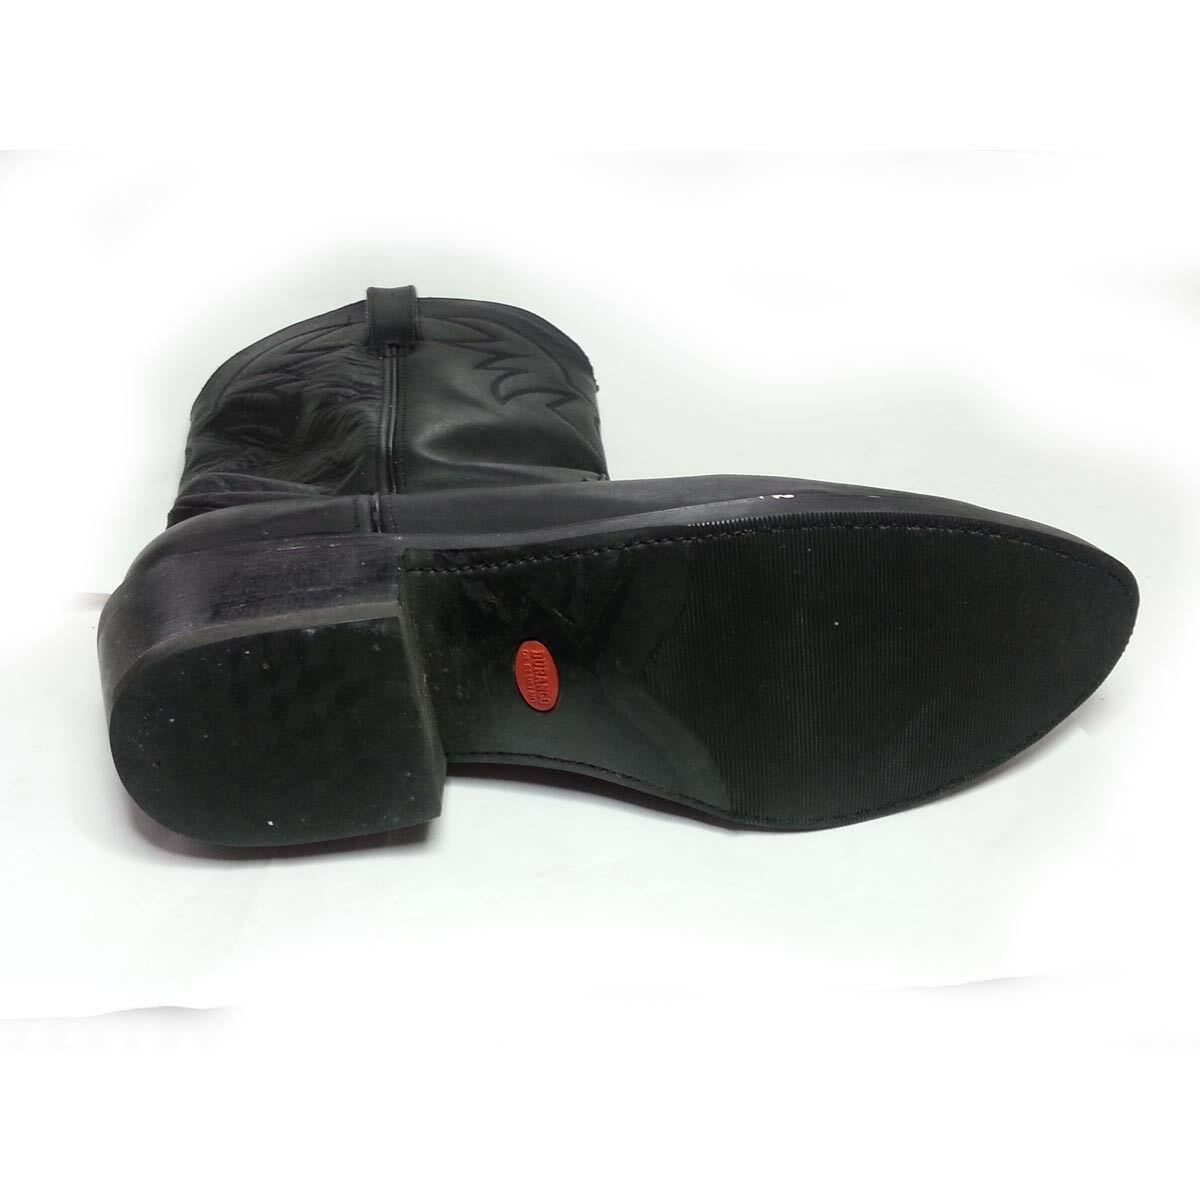 DURANGO Men Cowboy Boots Size 12 EE Black